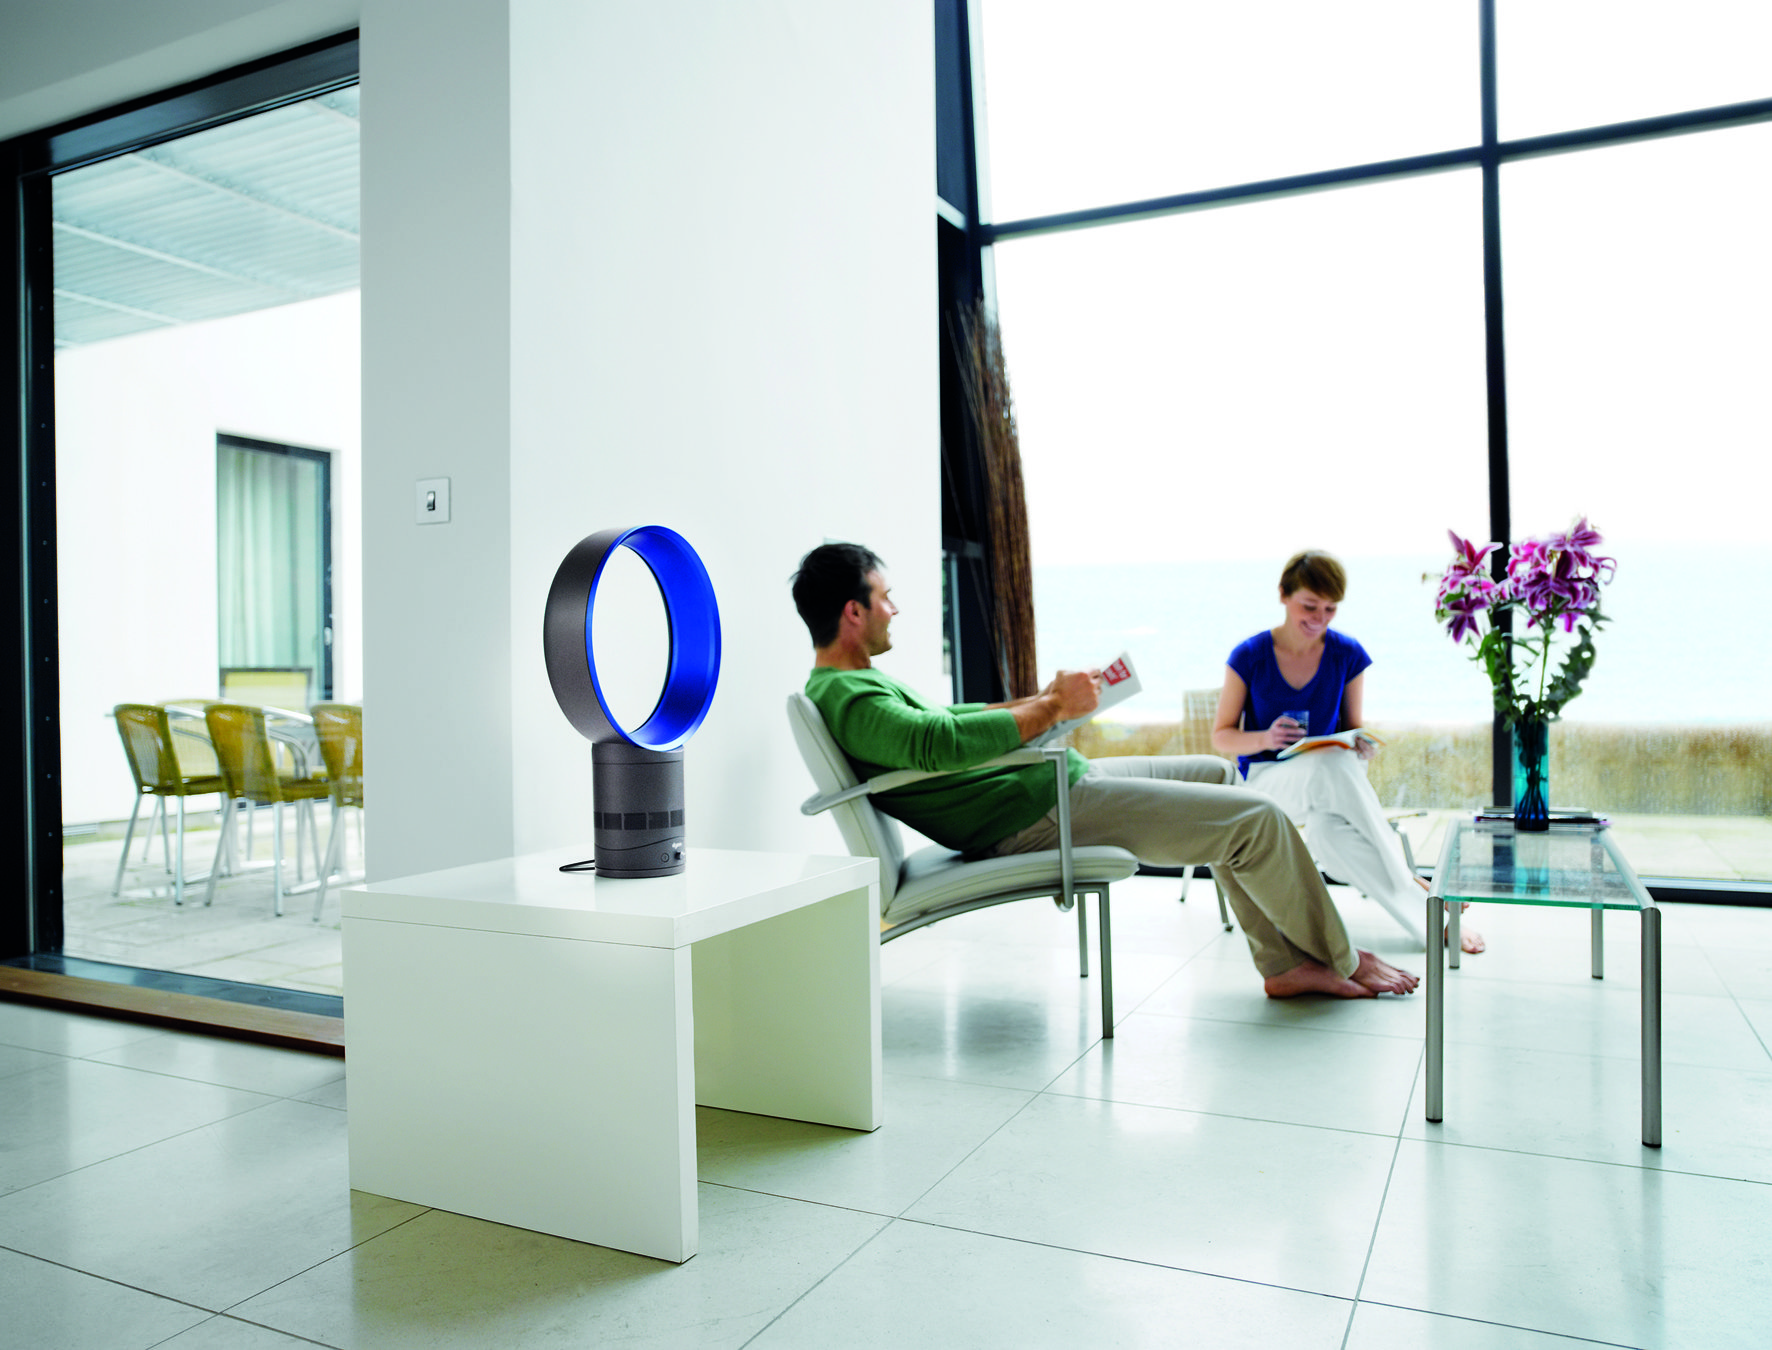 Ventilatori. L'aria fresca del design - Cose di Casa